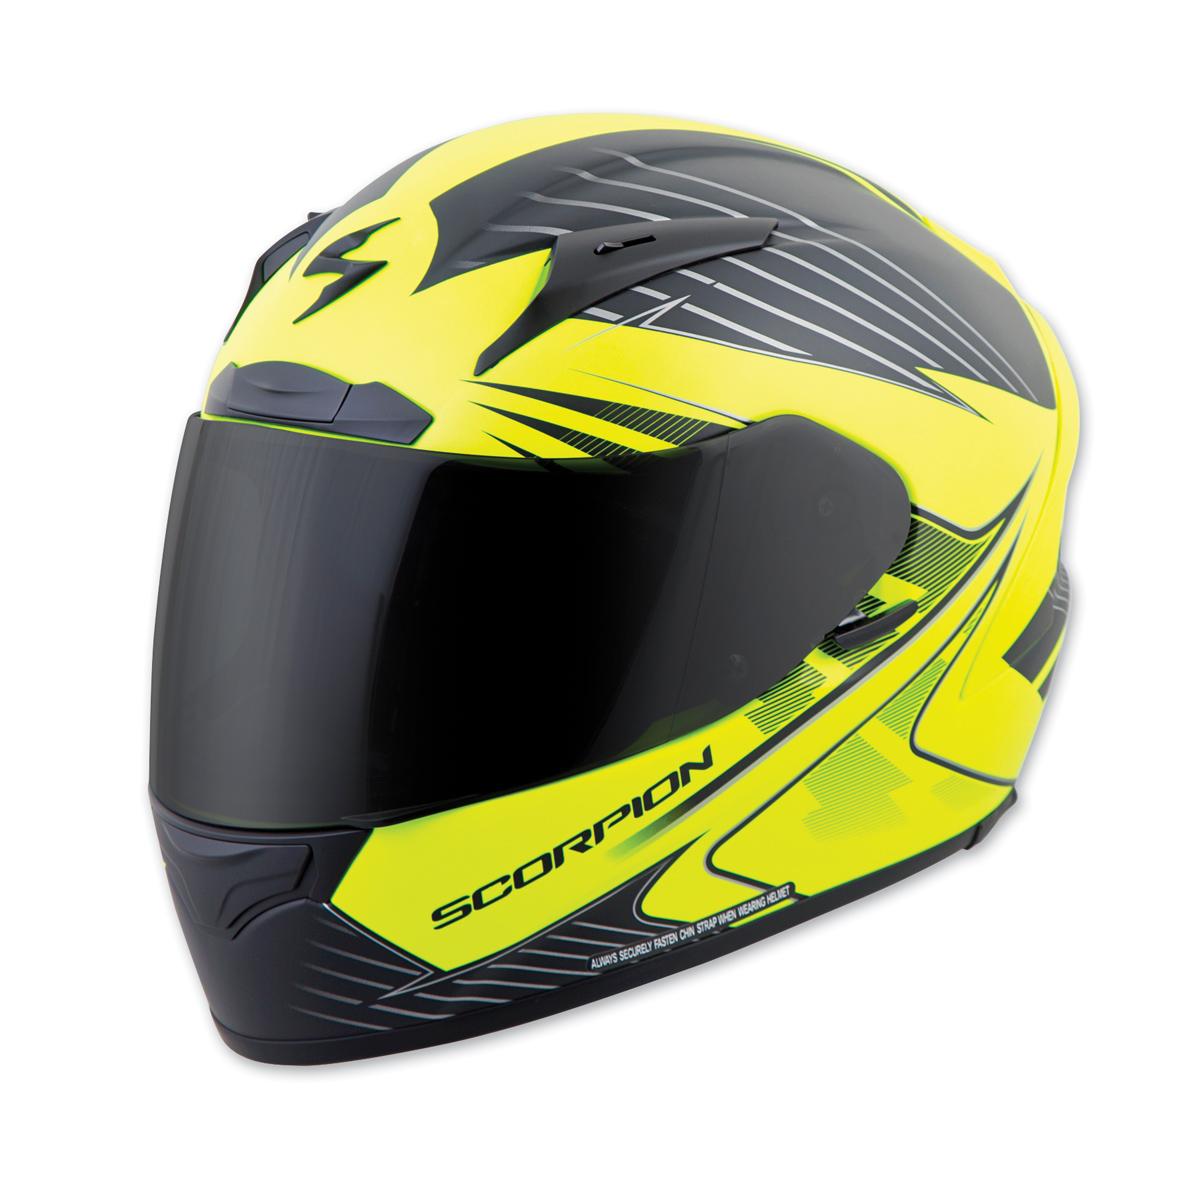 scorpion exo exo r2000 full face helmet ebay. Black Bedroom Furniture Sets. Home Design Ideas